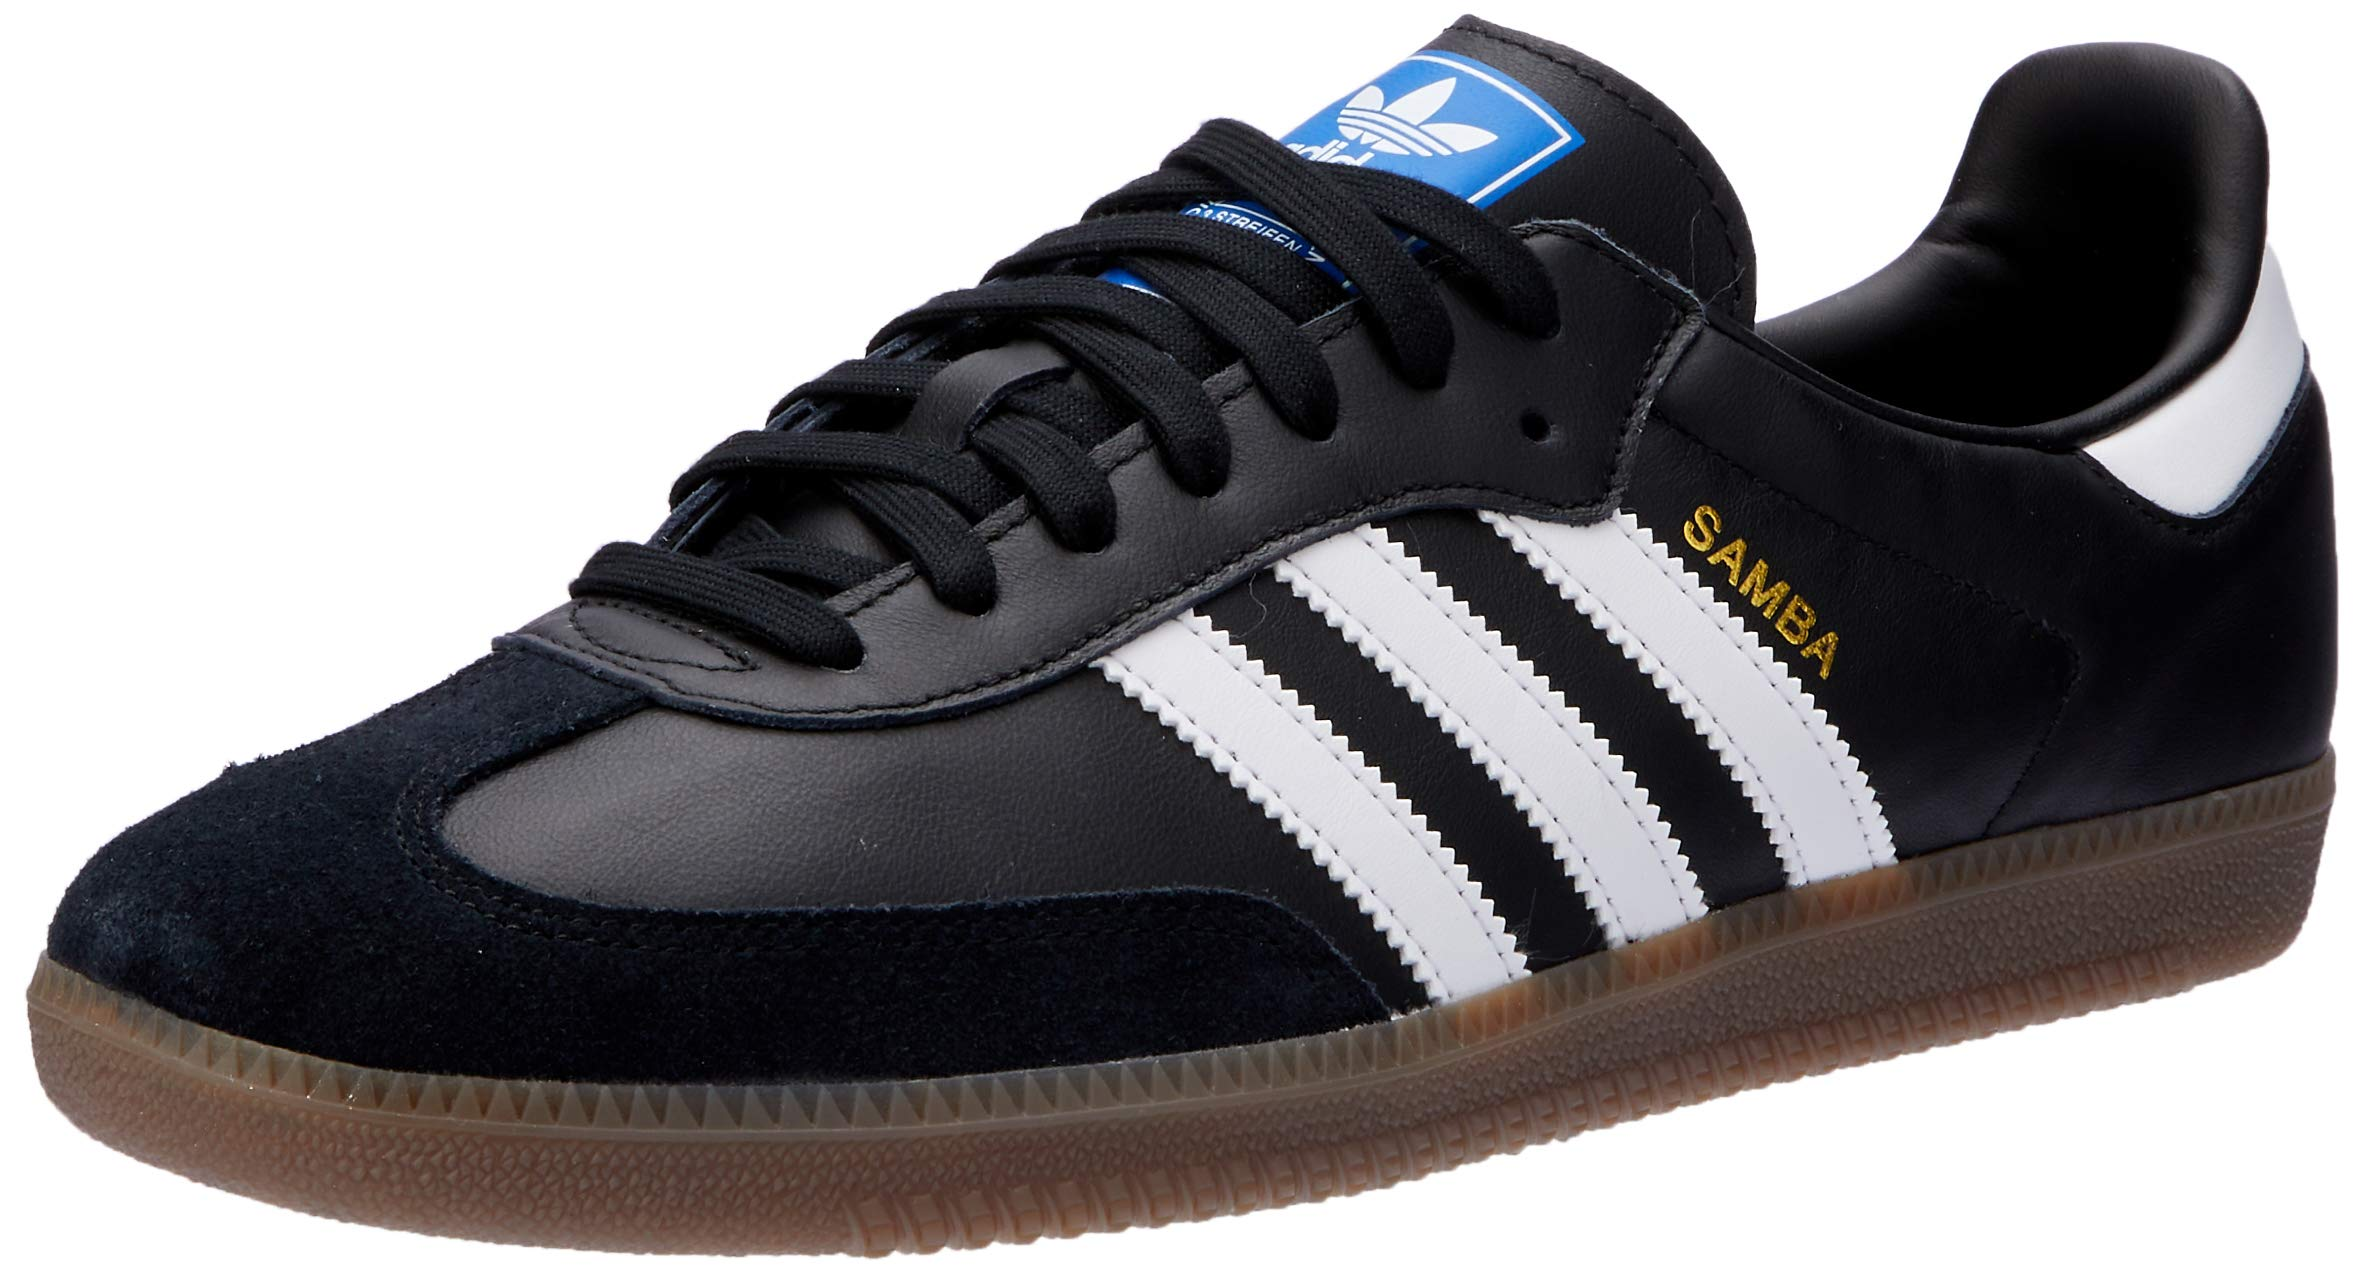 Mejor valorados en Zapatos para hombre & Opiniones útiles de ...